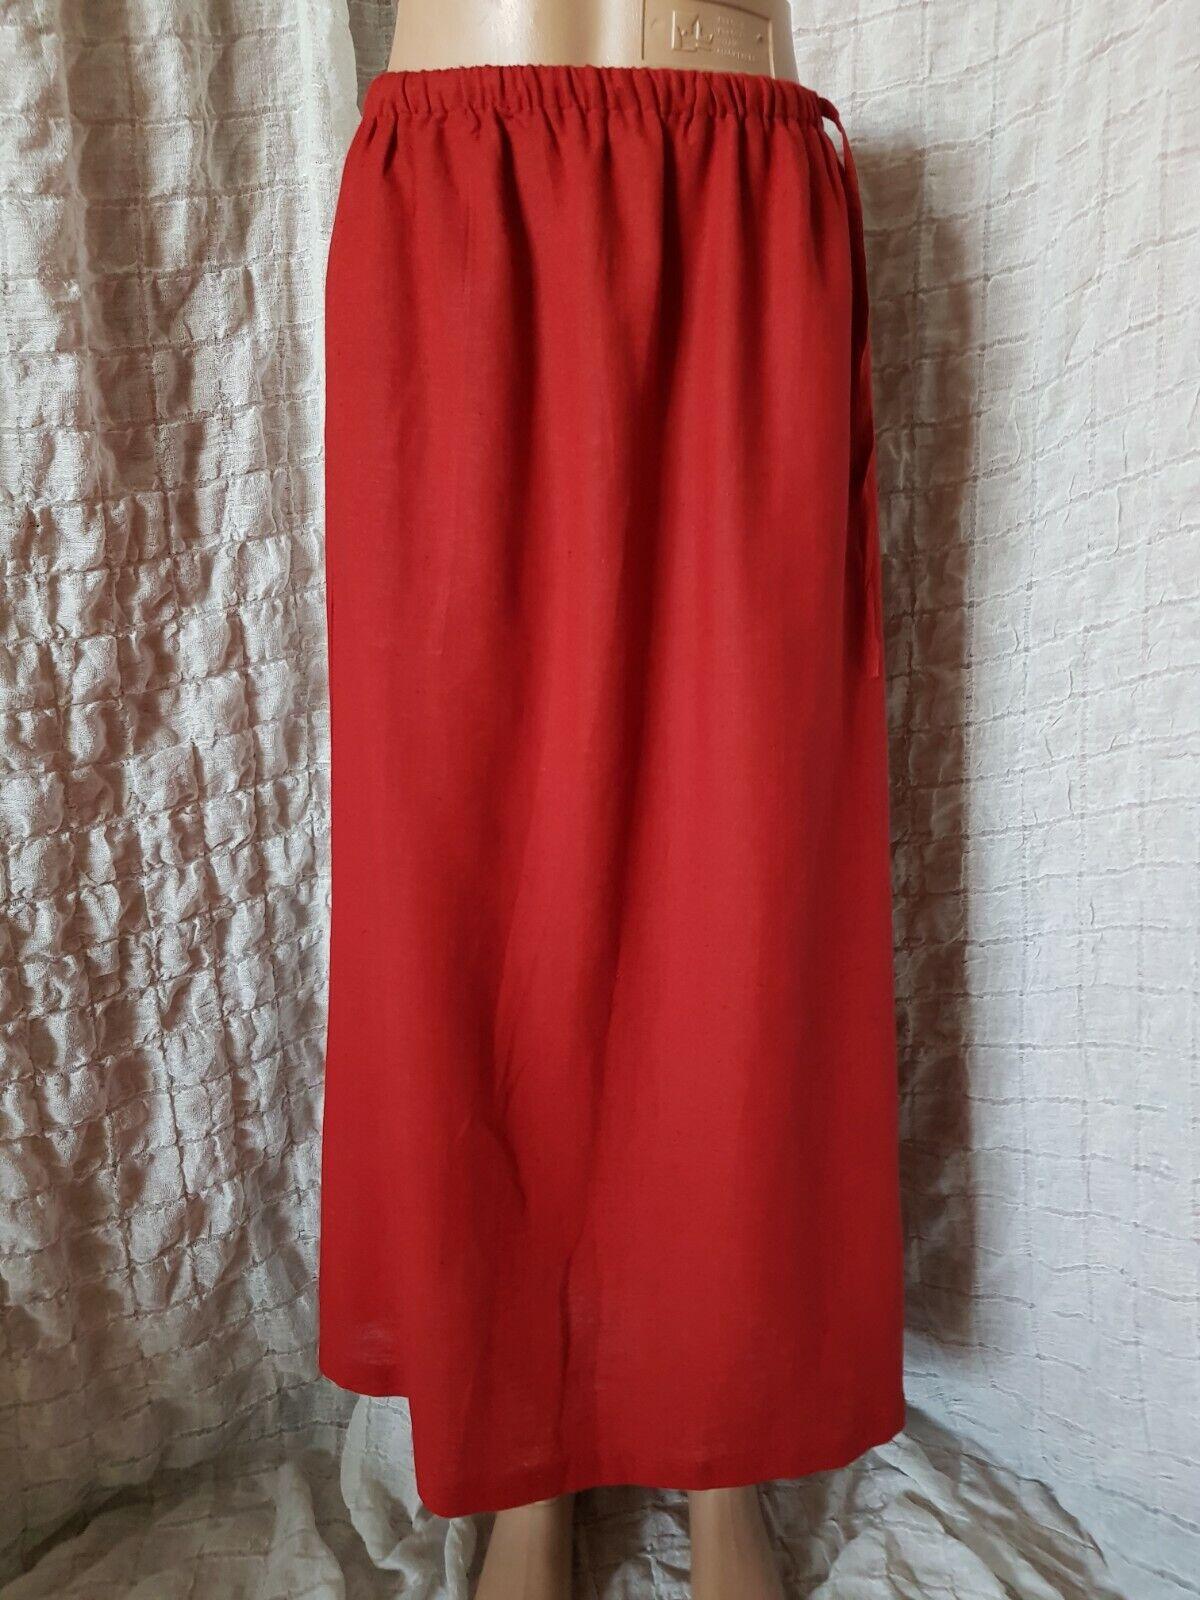 Gudrun Sjoden red viscose flax maxi skirt size S, BNWT